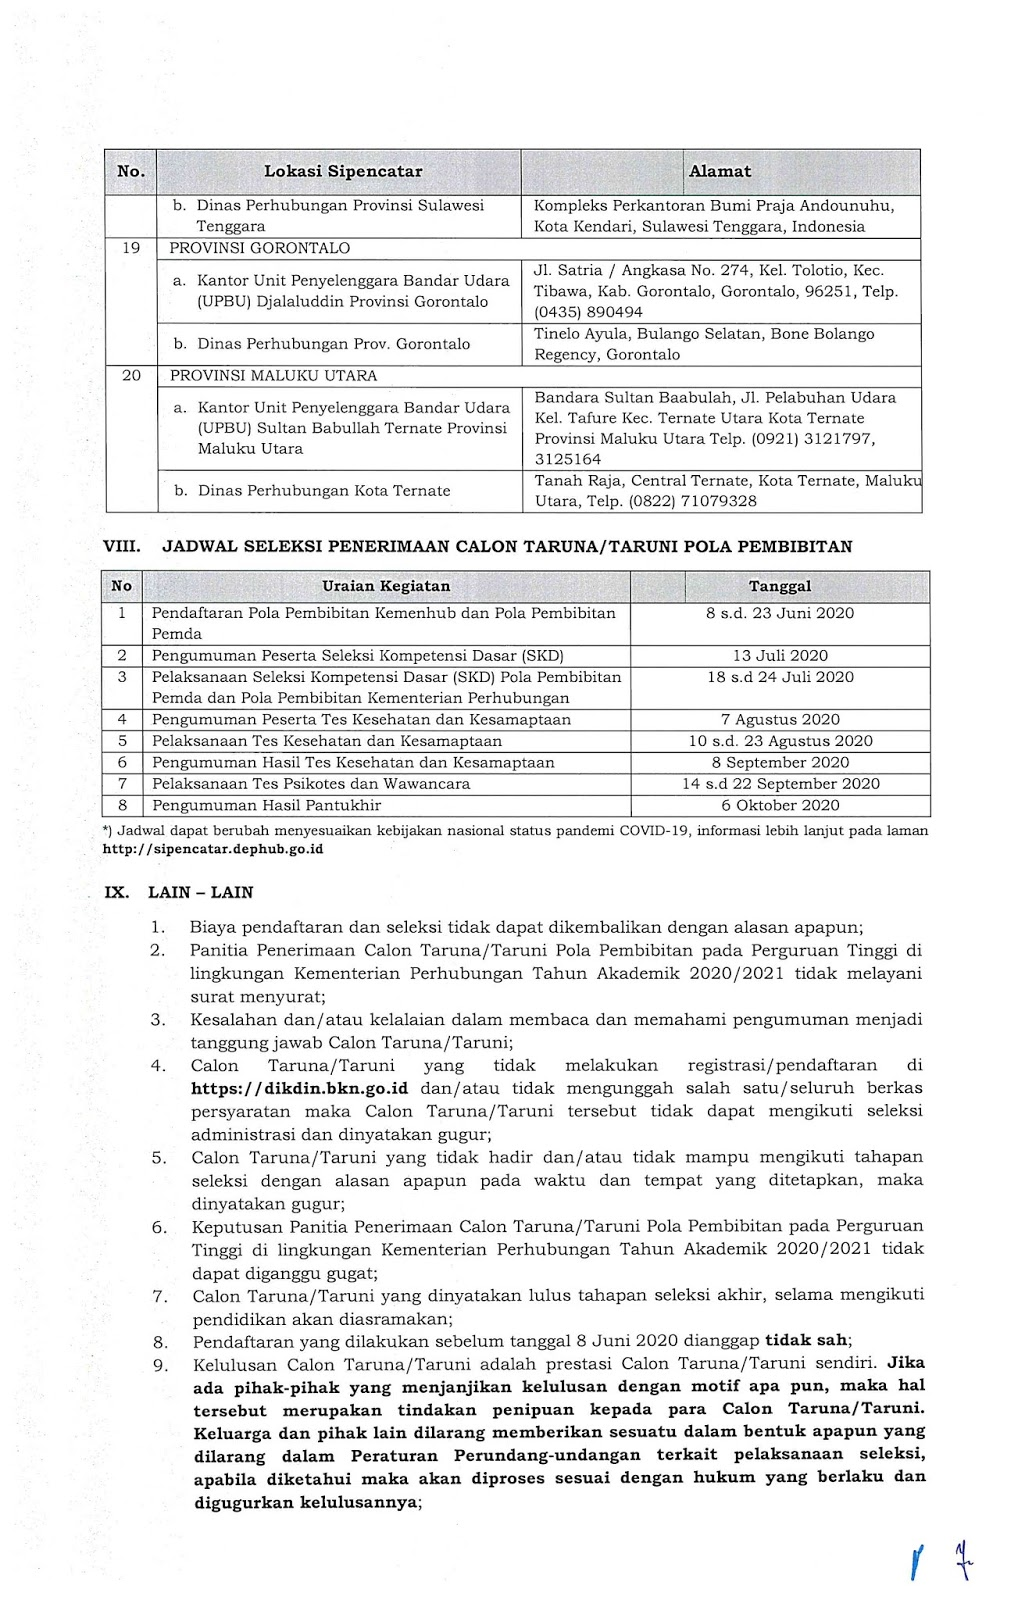 Penerimaan Calon Taruna/Taruni Pola Pembibitan Pada Perguruan Tinggi Di Lingkungan Kementerian Perhubungan Tahun Akademik 2020/2021